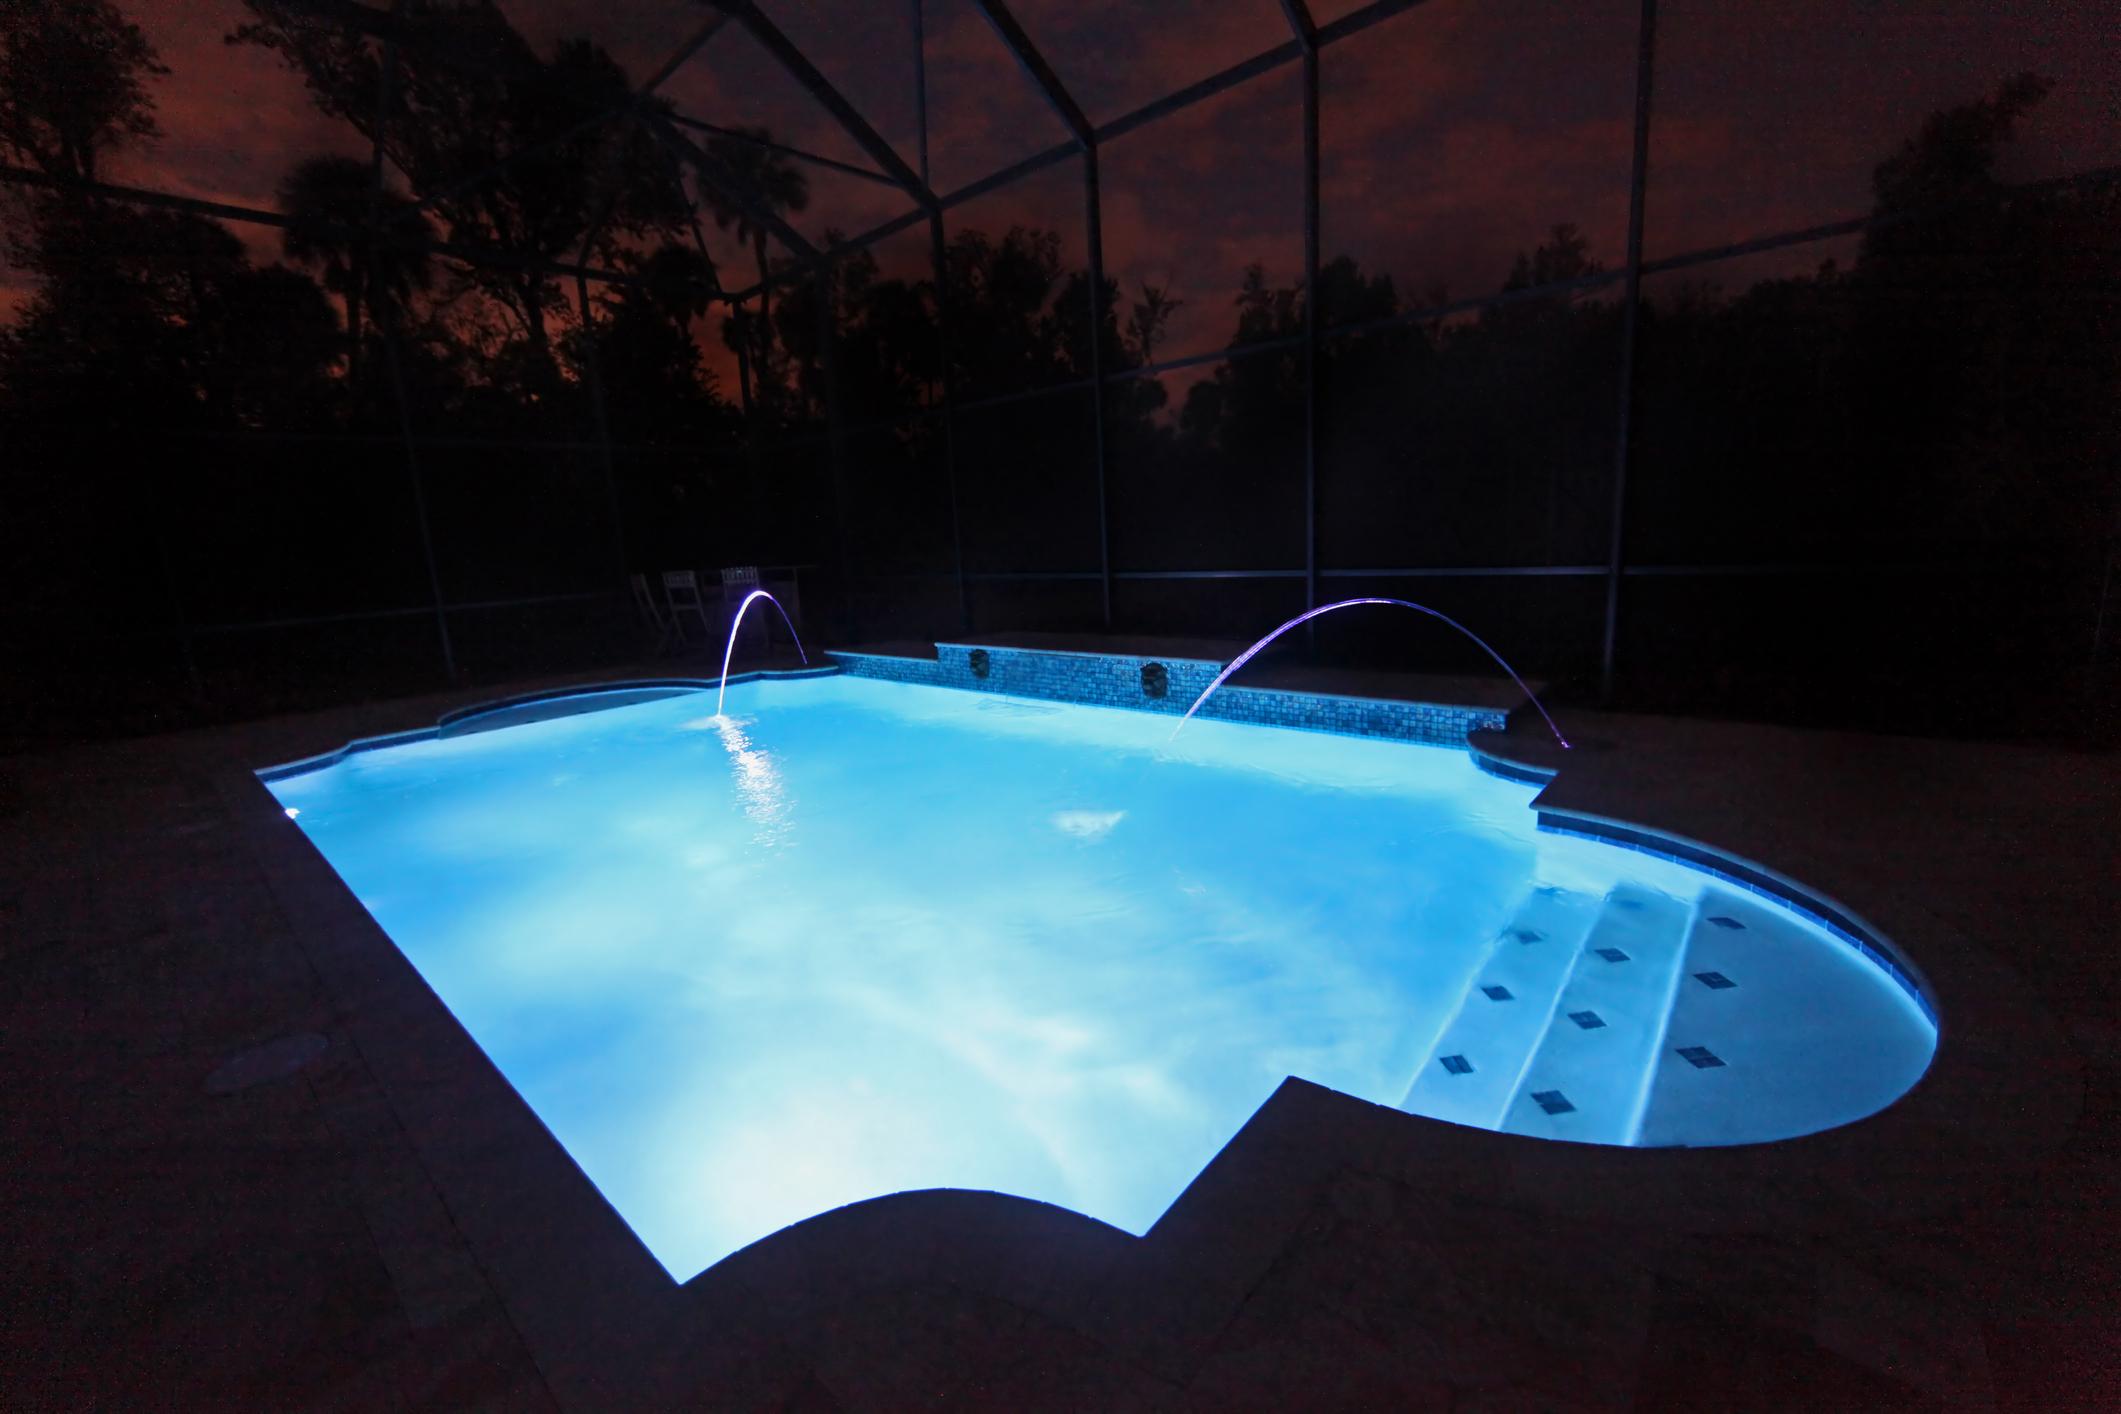 swimming pool, pool troopers